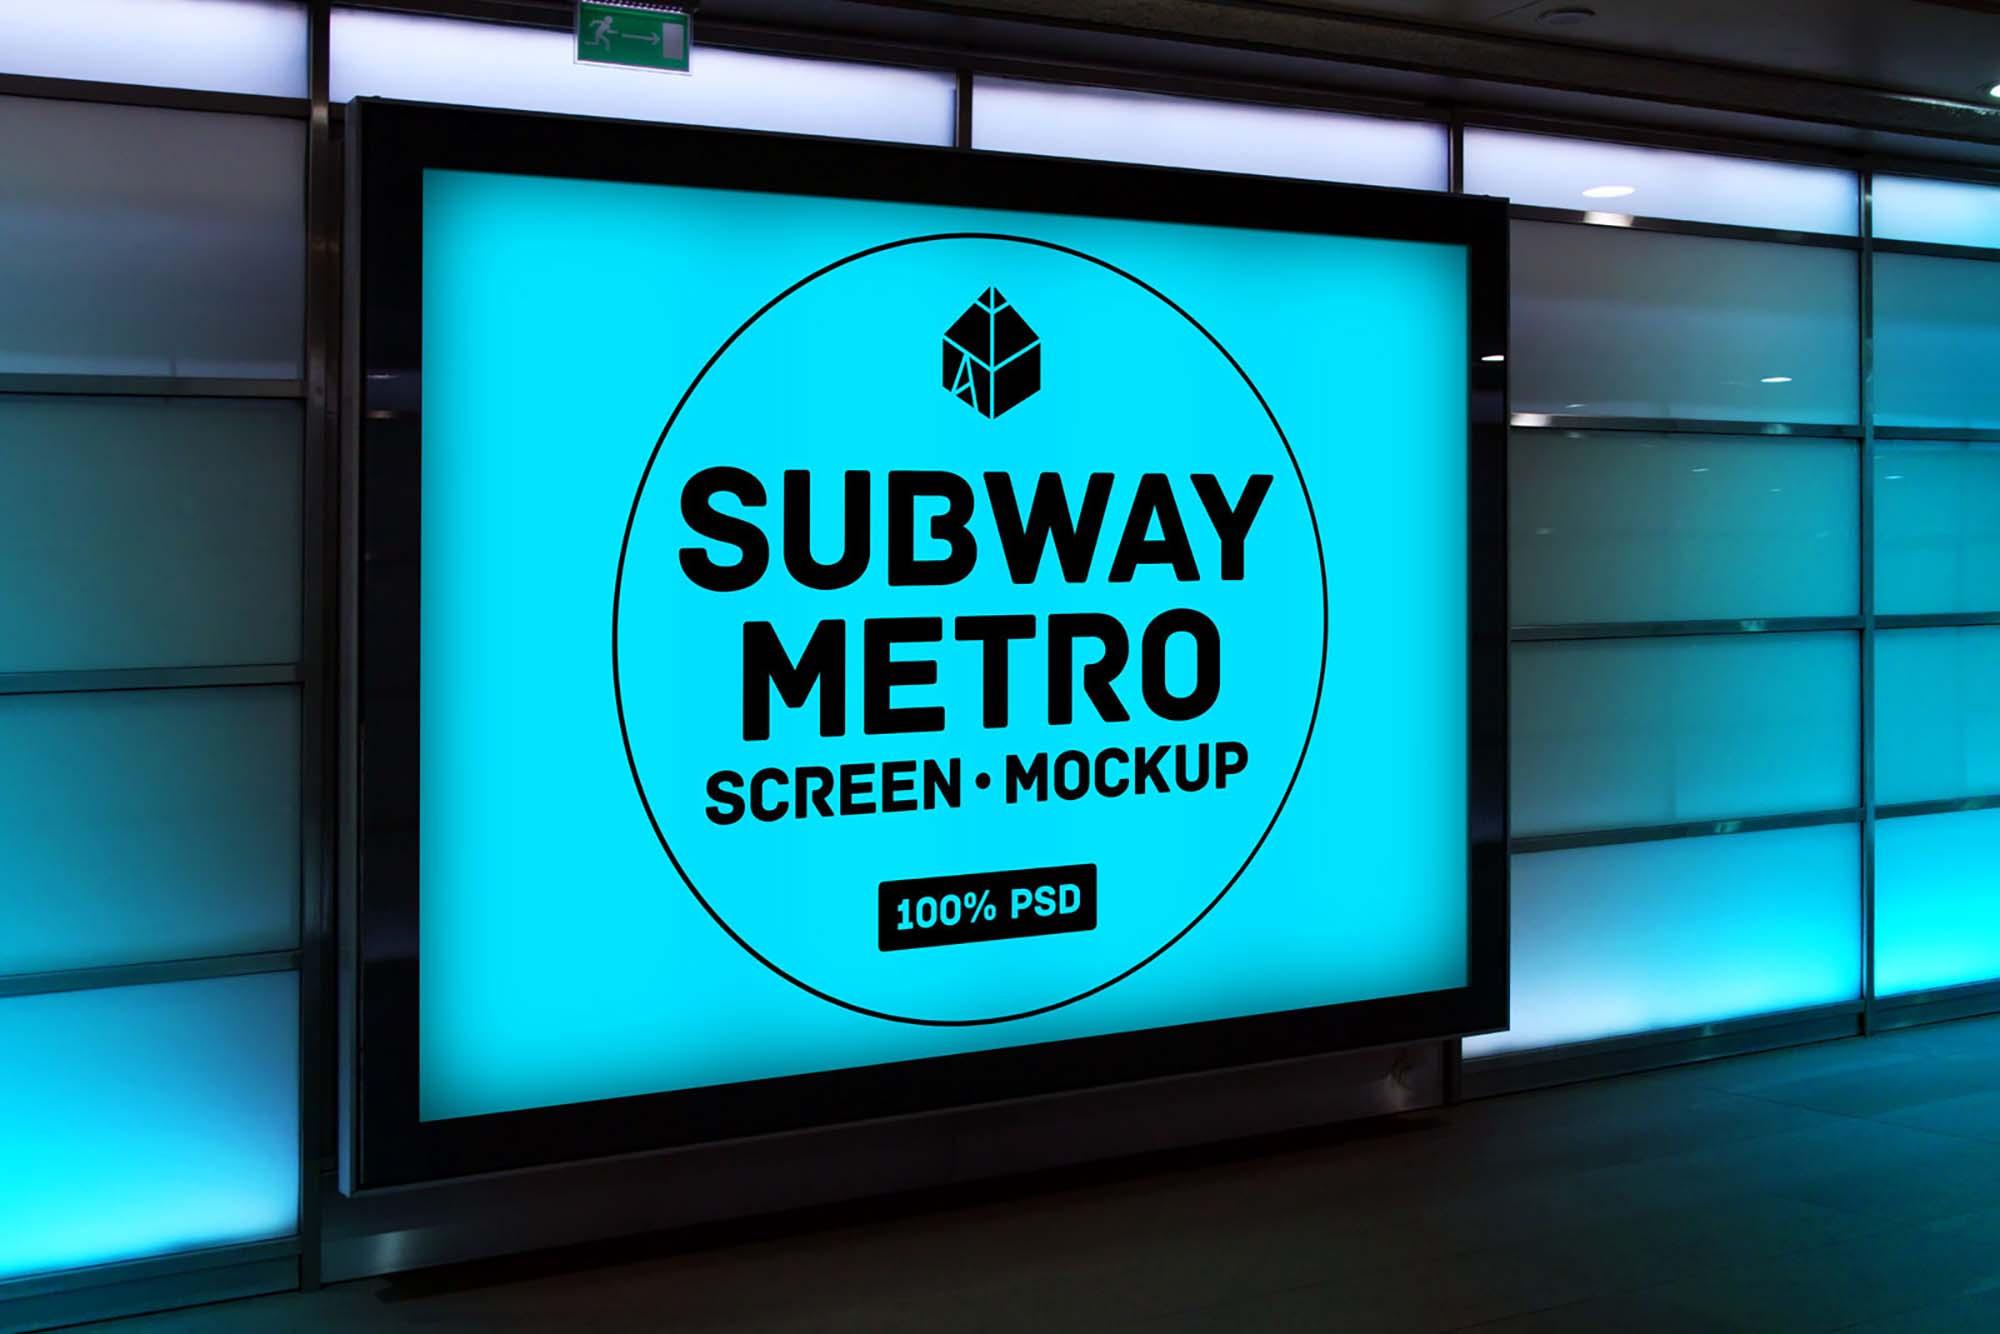 Subway Metro Screen Mockup